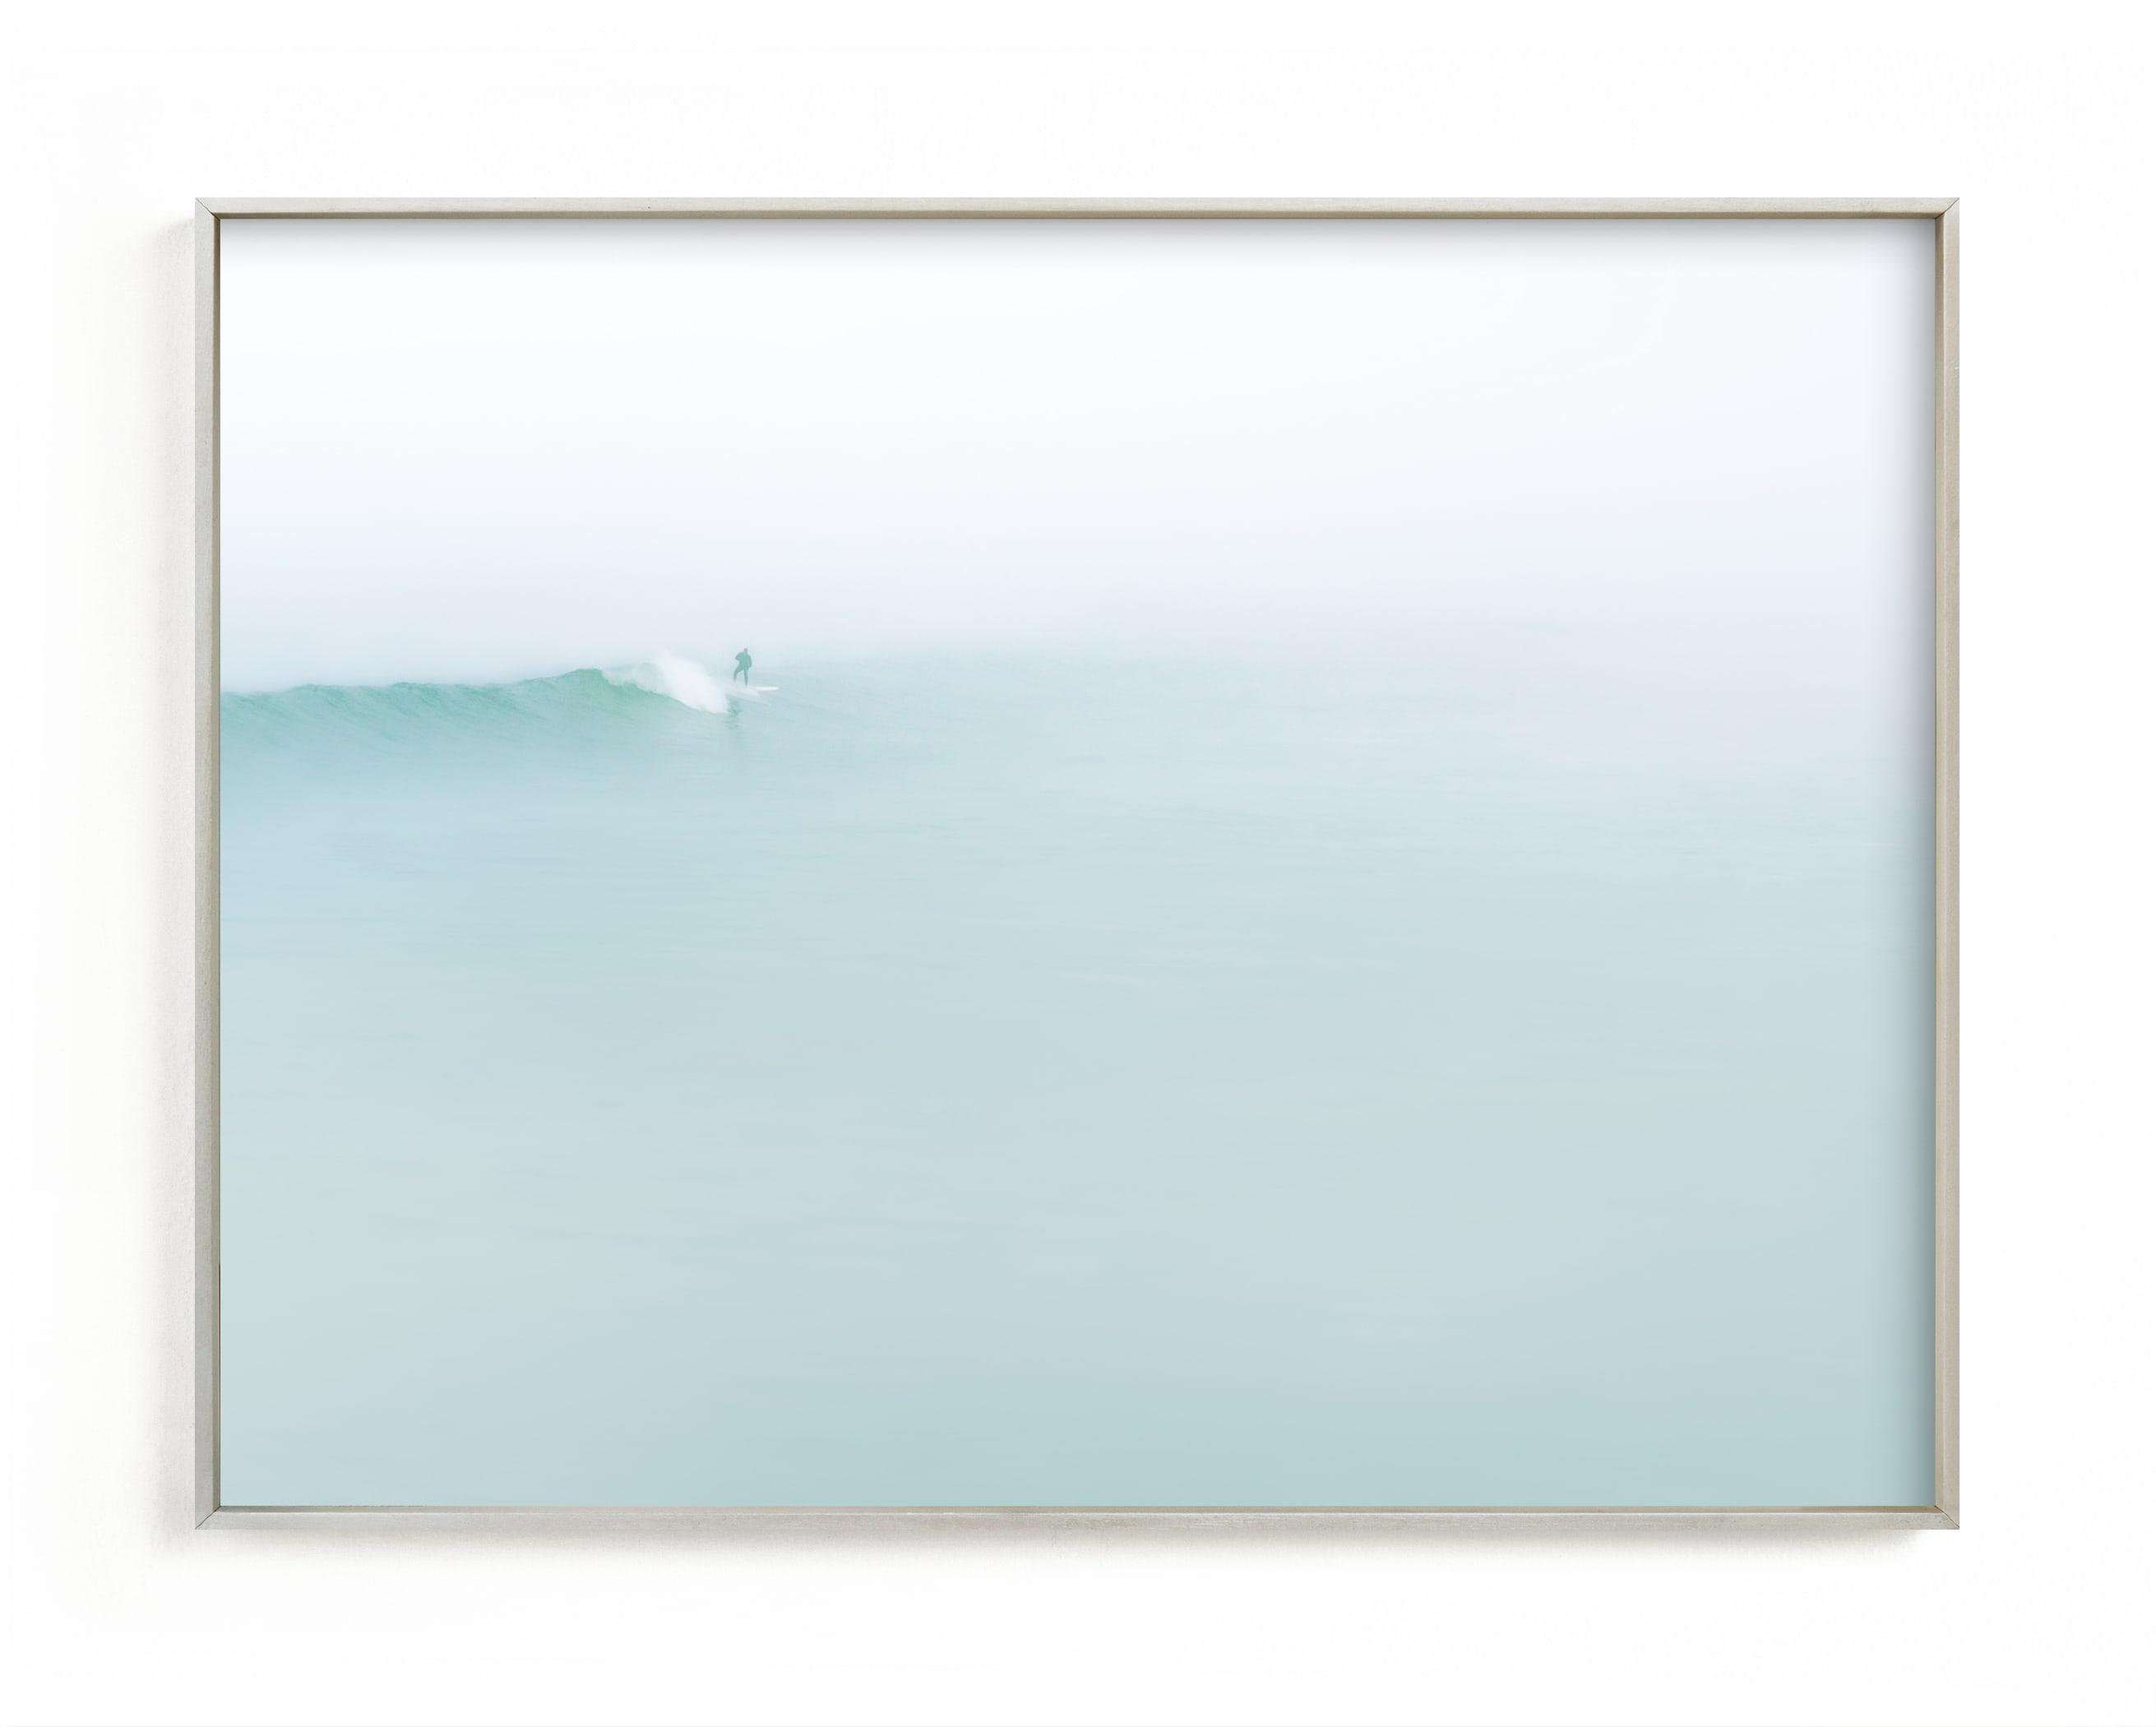 Morning Surf Wall Art Print